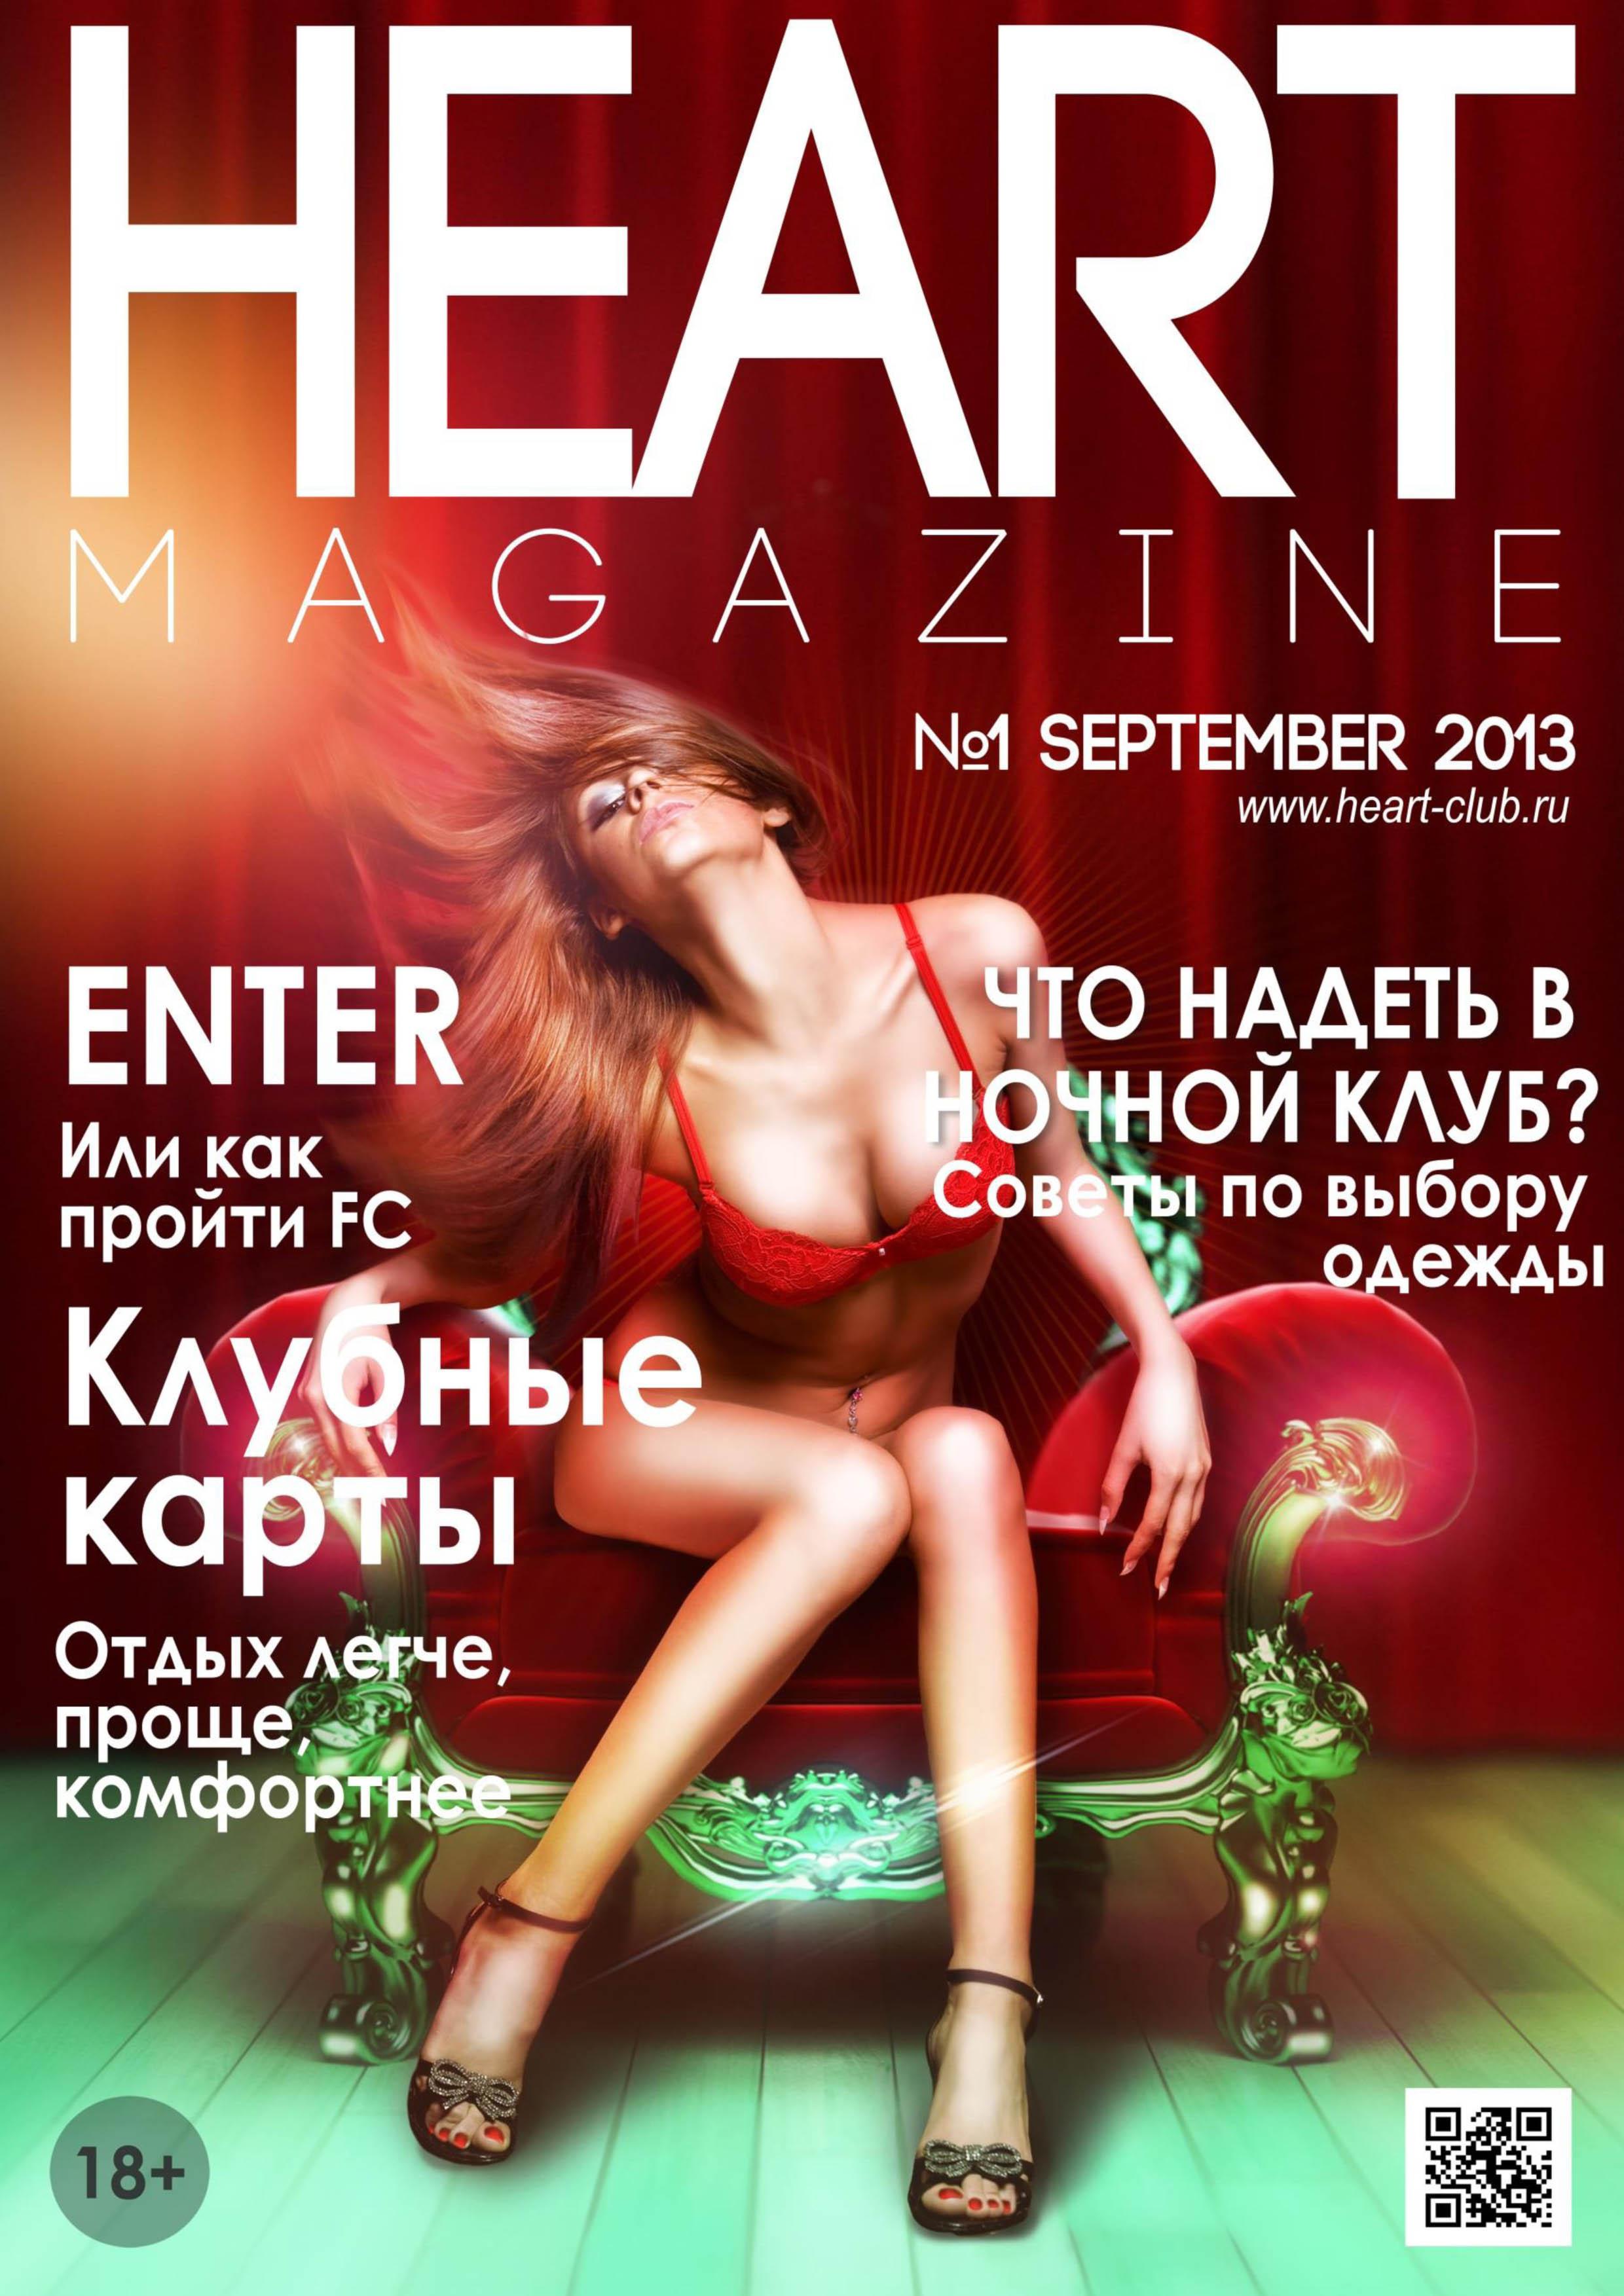 Heart Magazine cover